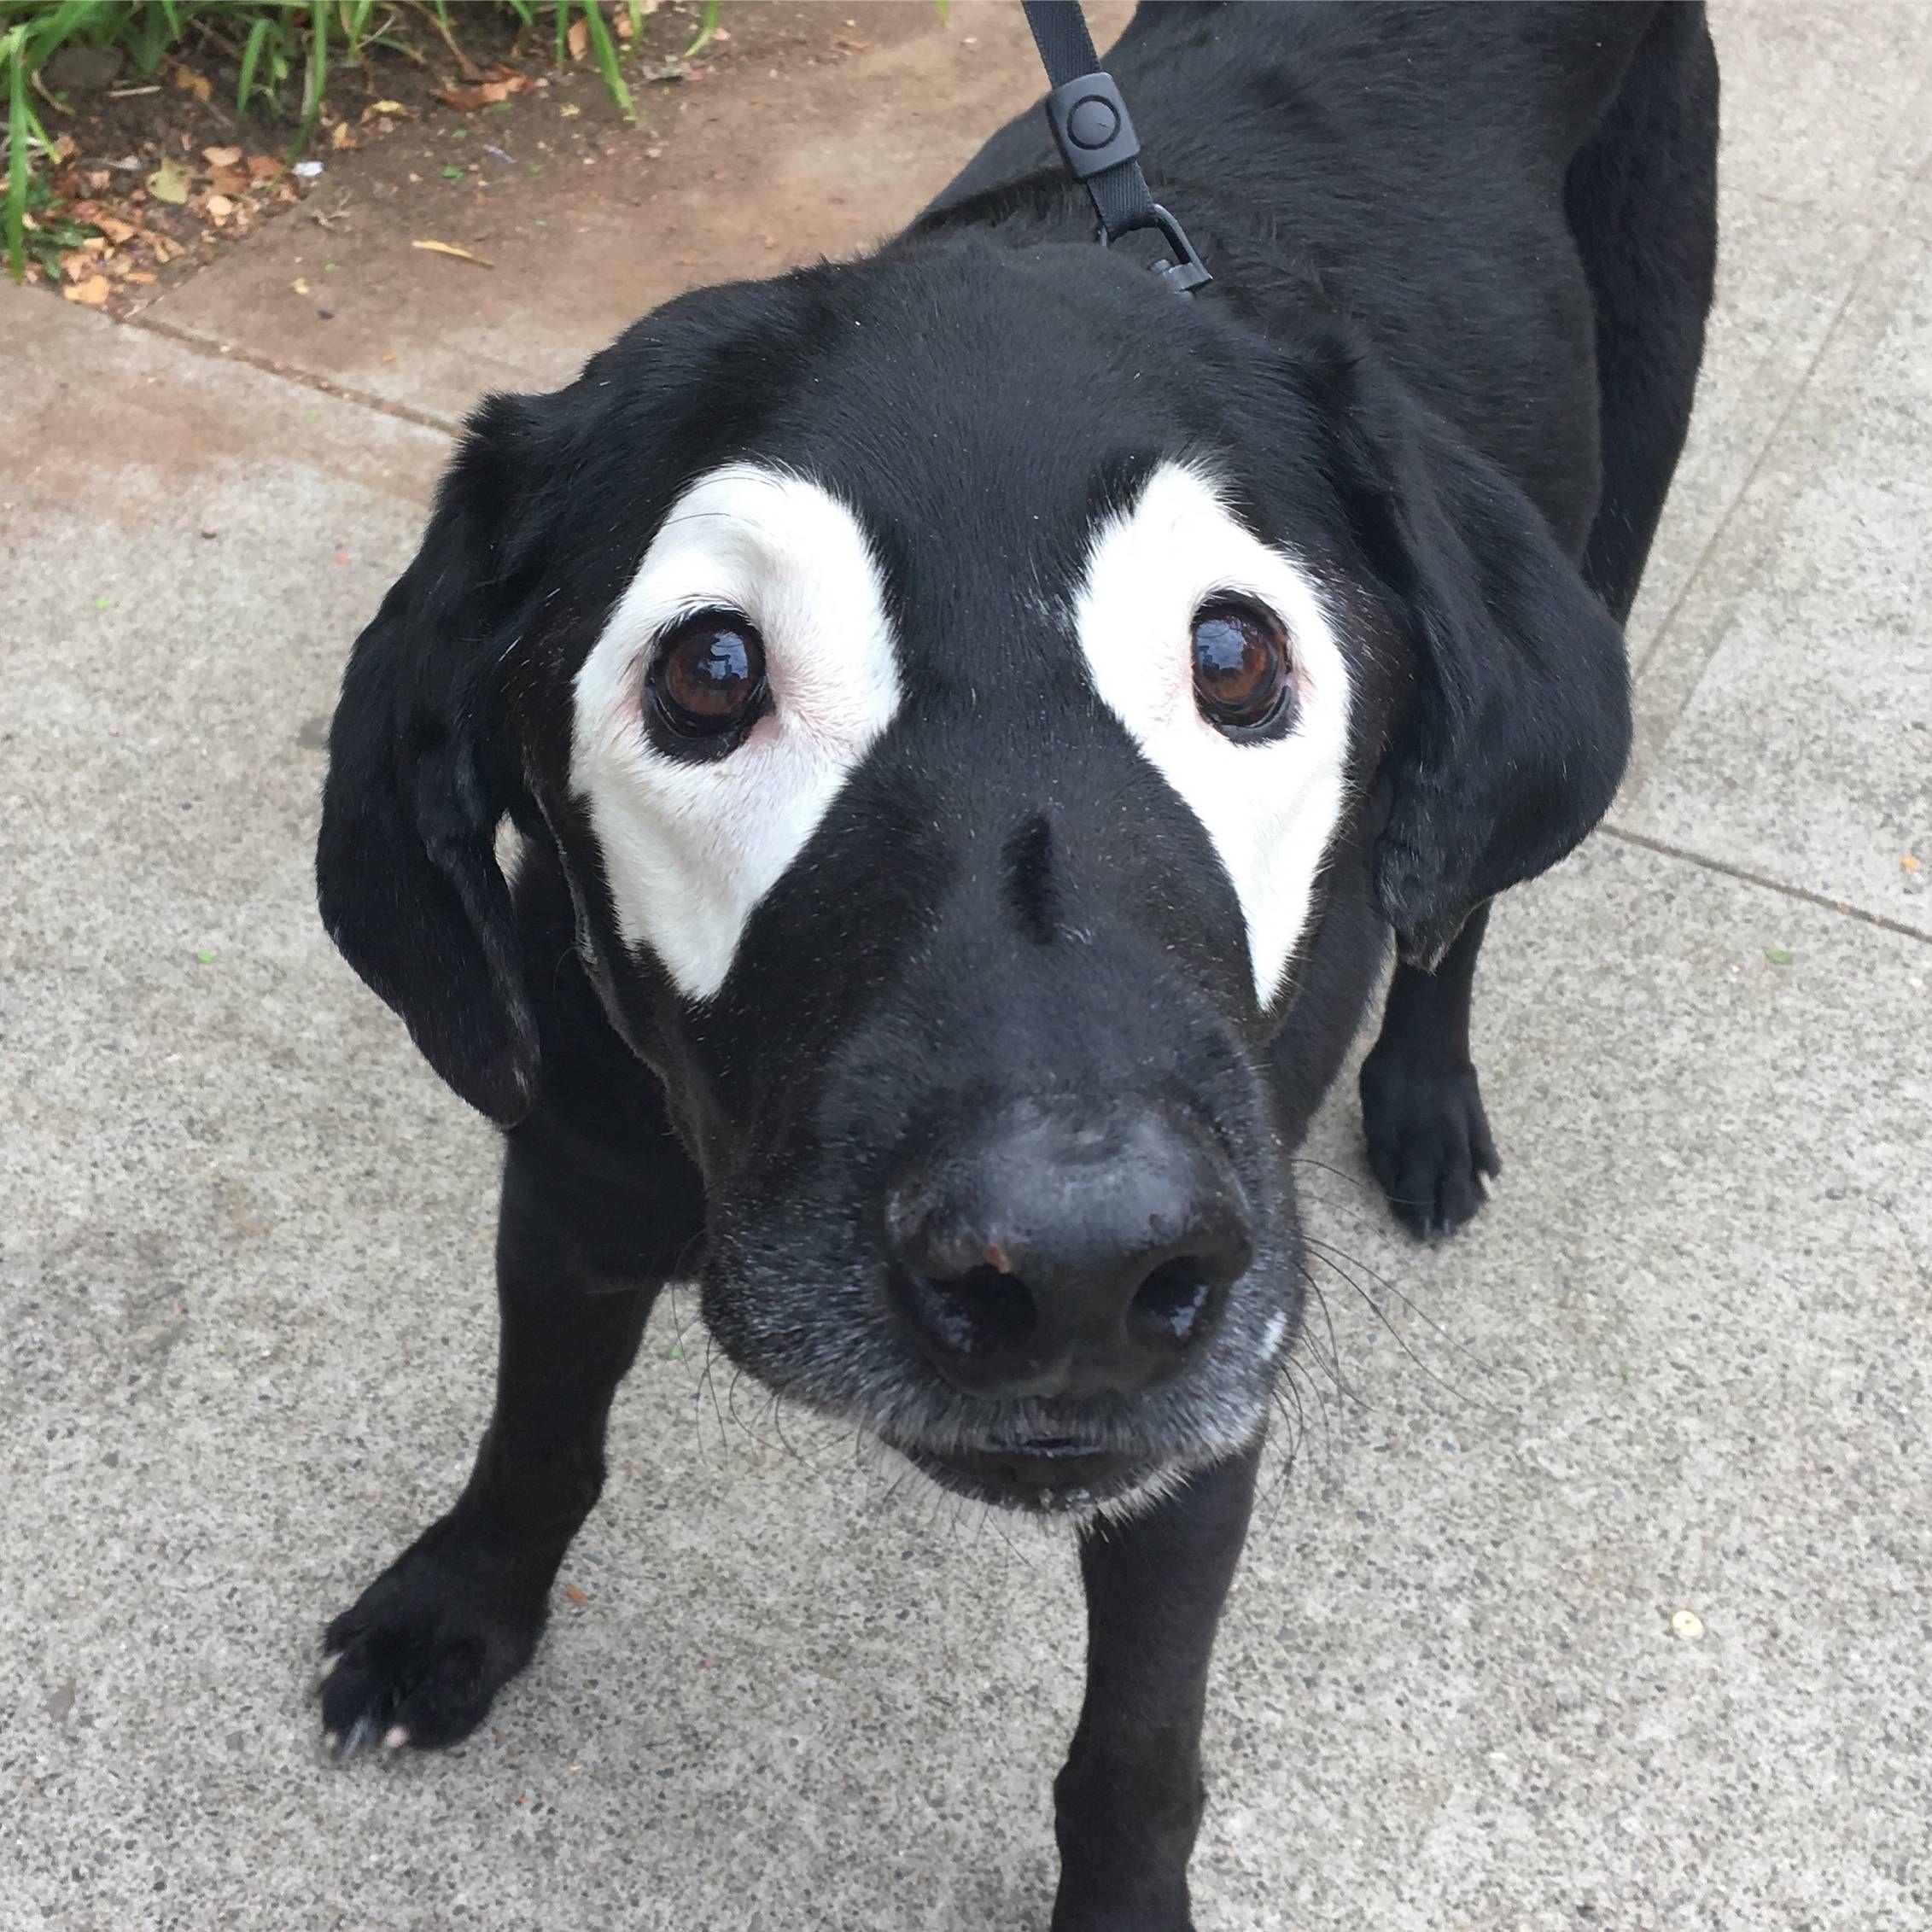 Good Labrador Black Adorable Dog - 072e411281a22b552b5b9644a5f04e6f  Pictures_817632  .jpg